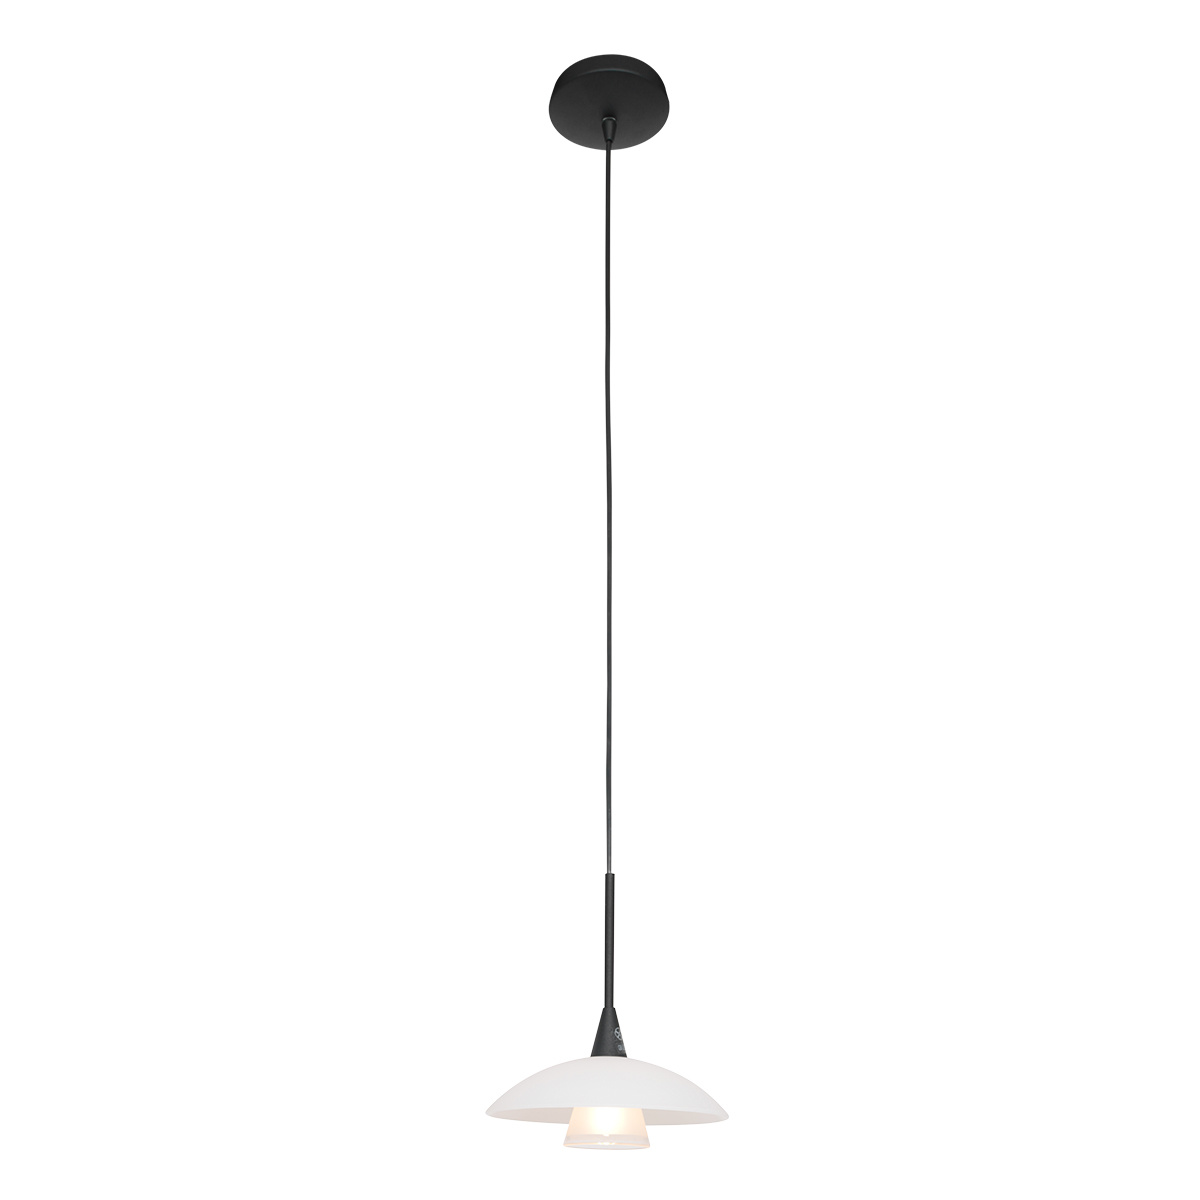 Steinhauer Hanglamp tallerken LED 2655zw zwart